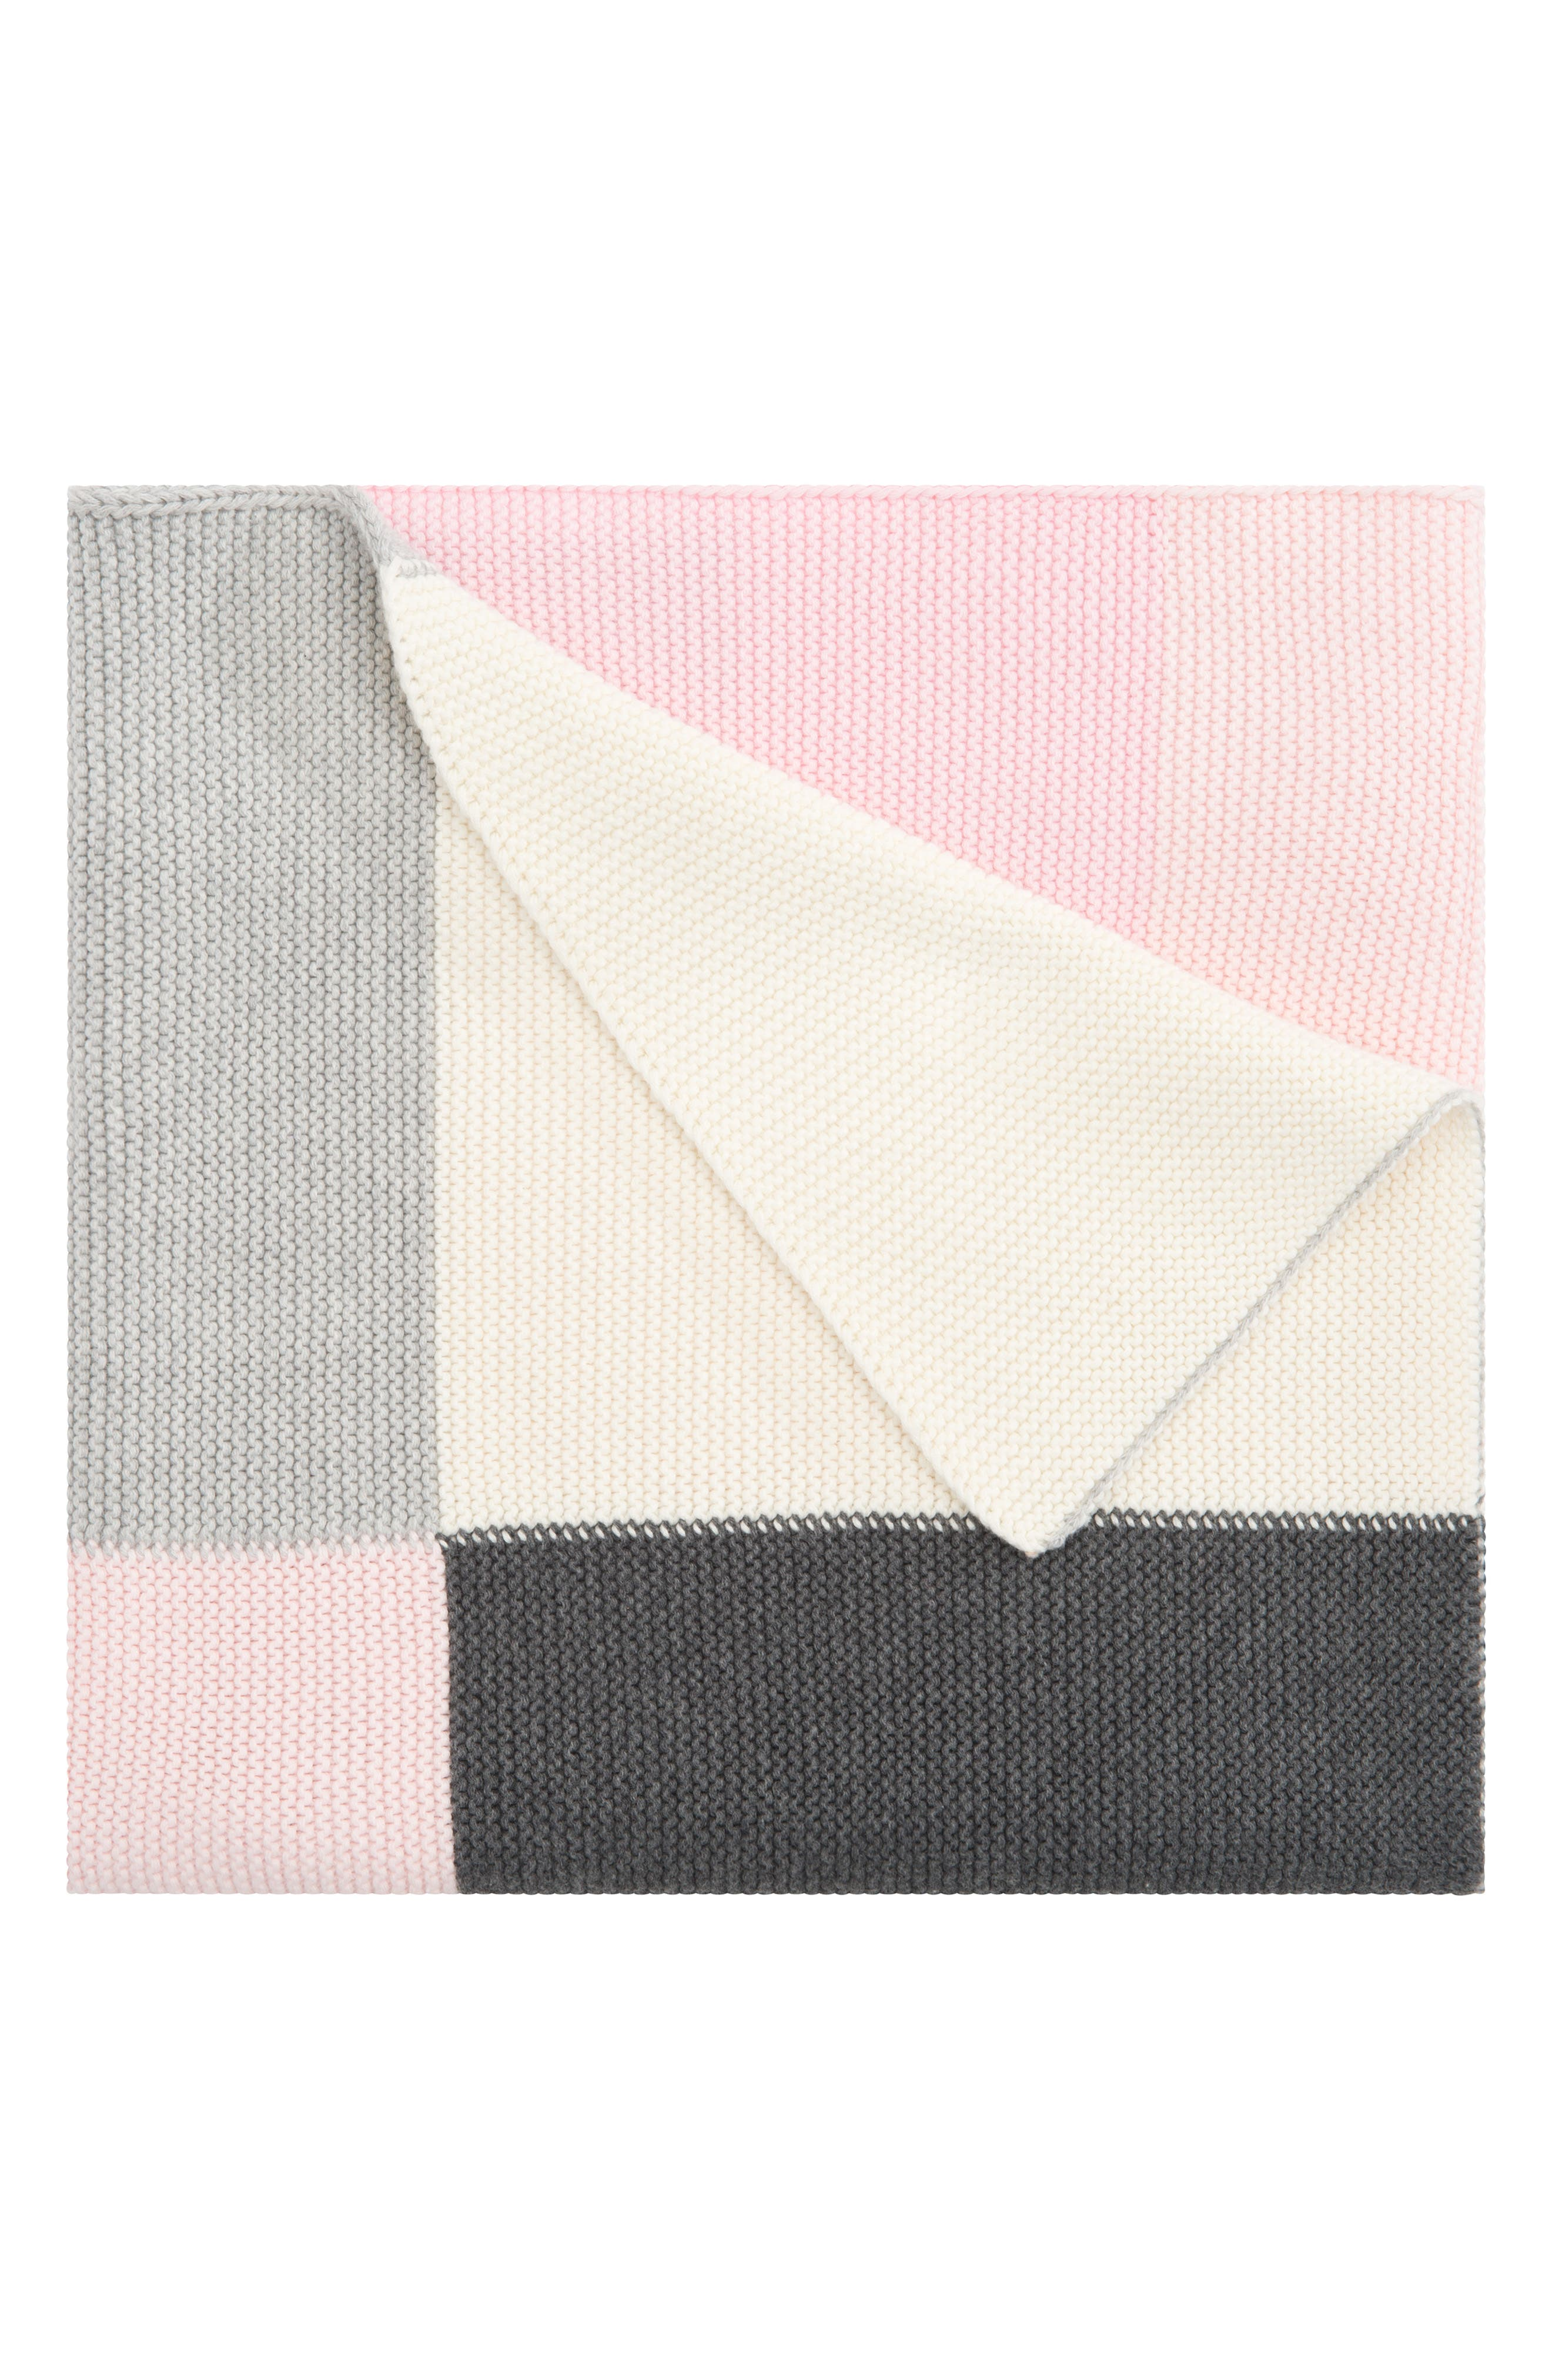 Main Image - Elegant Baby 'Patchwork' Knit Blanket